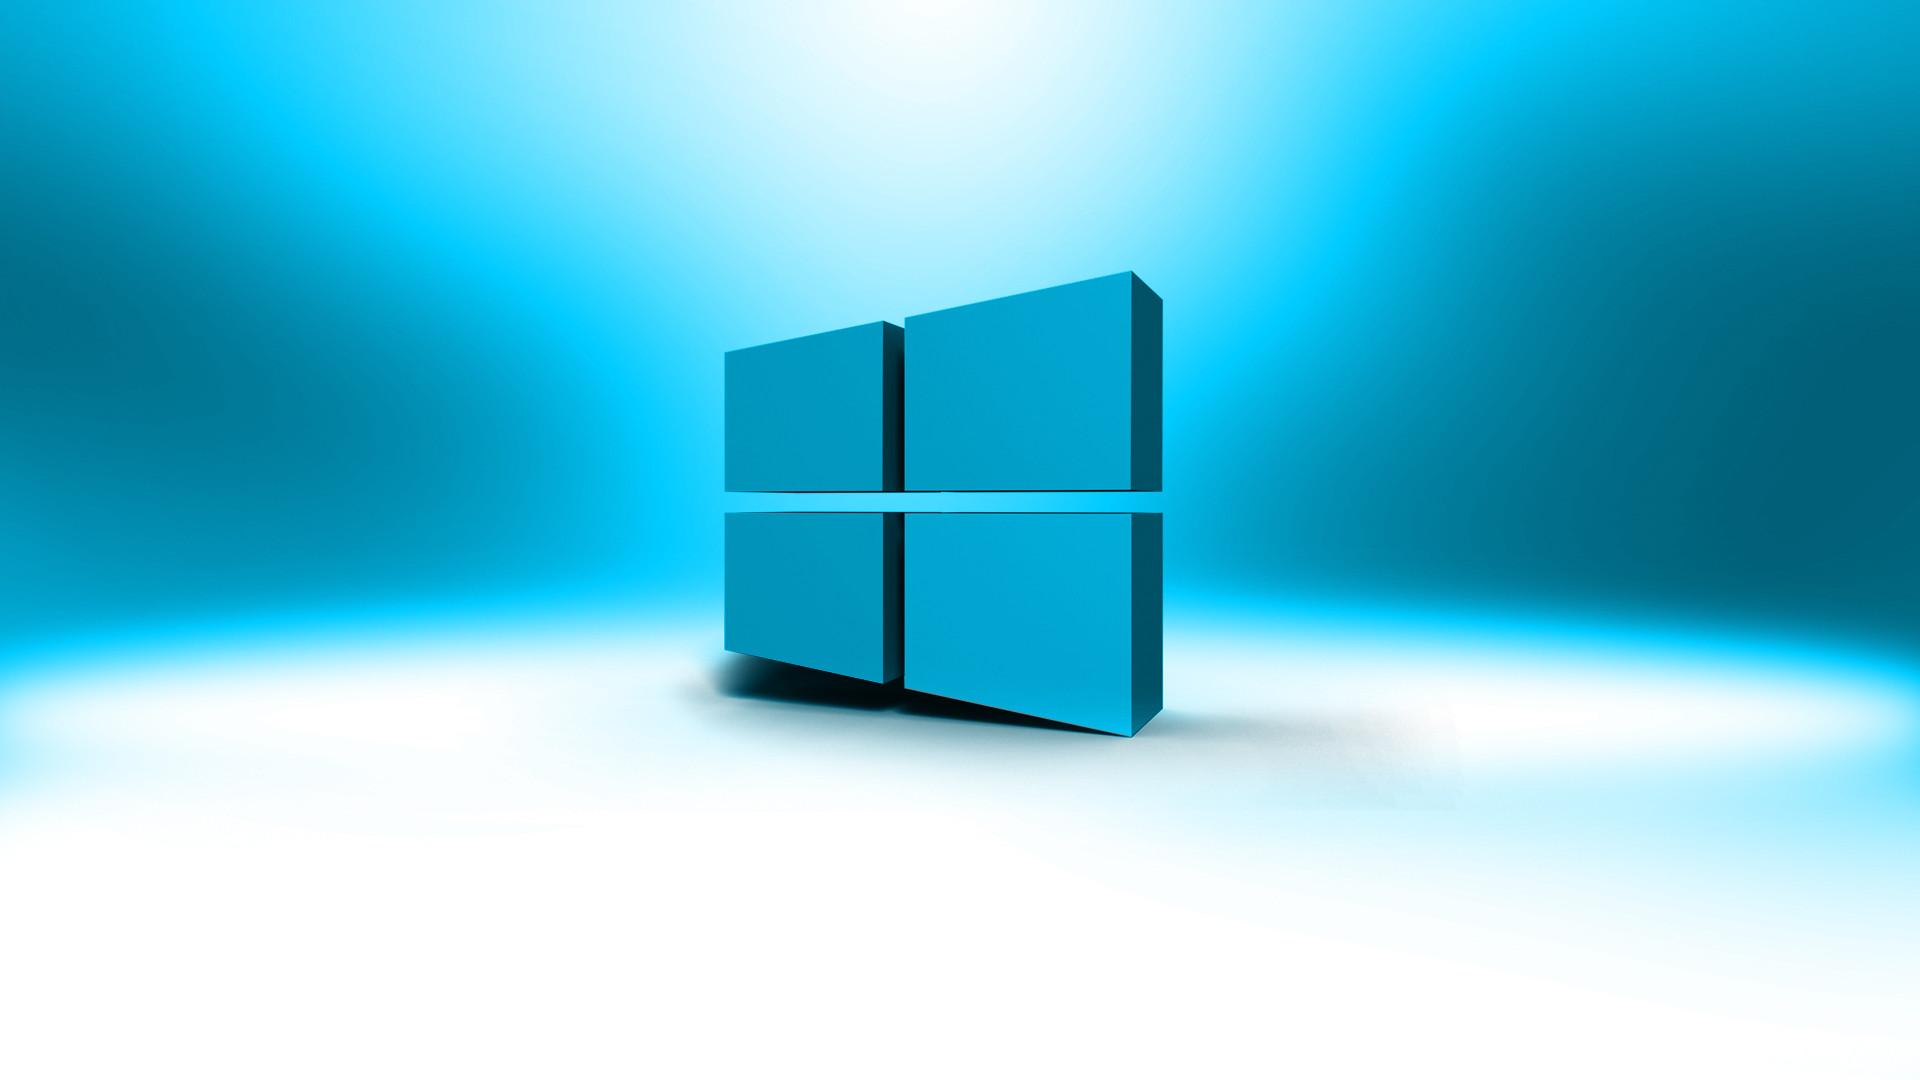 Desktop wallpaper slideshow windows xp